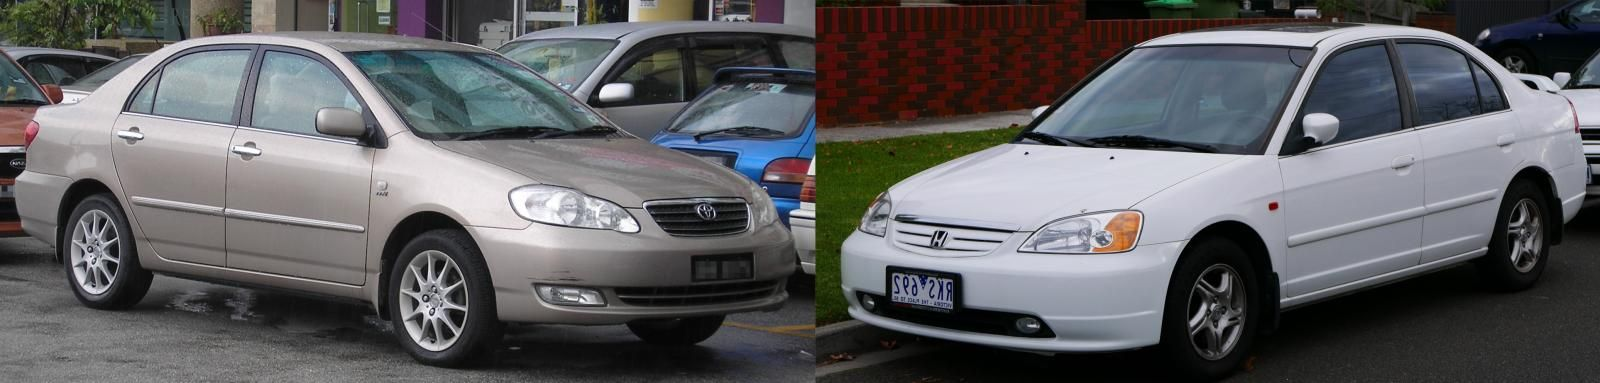 2005-Corolla-vs-Civic-front-view